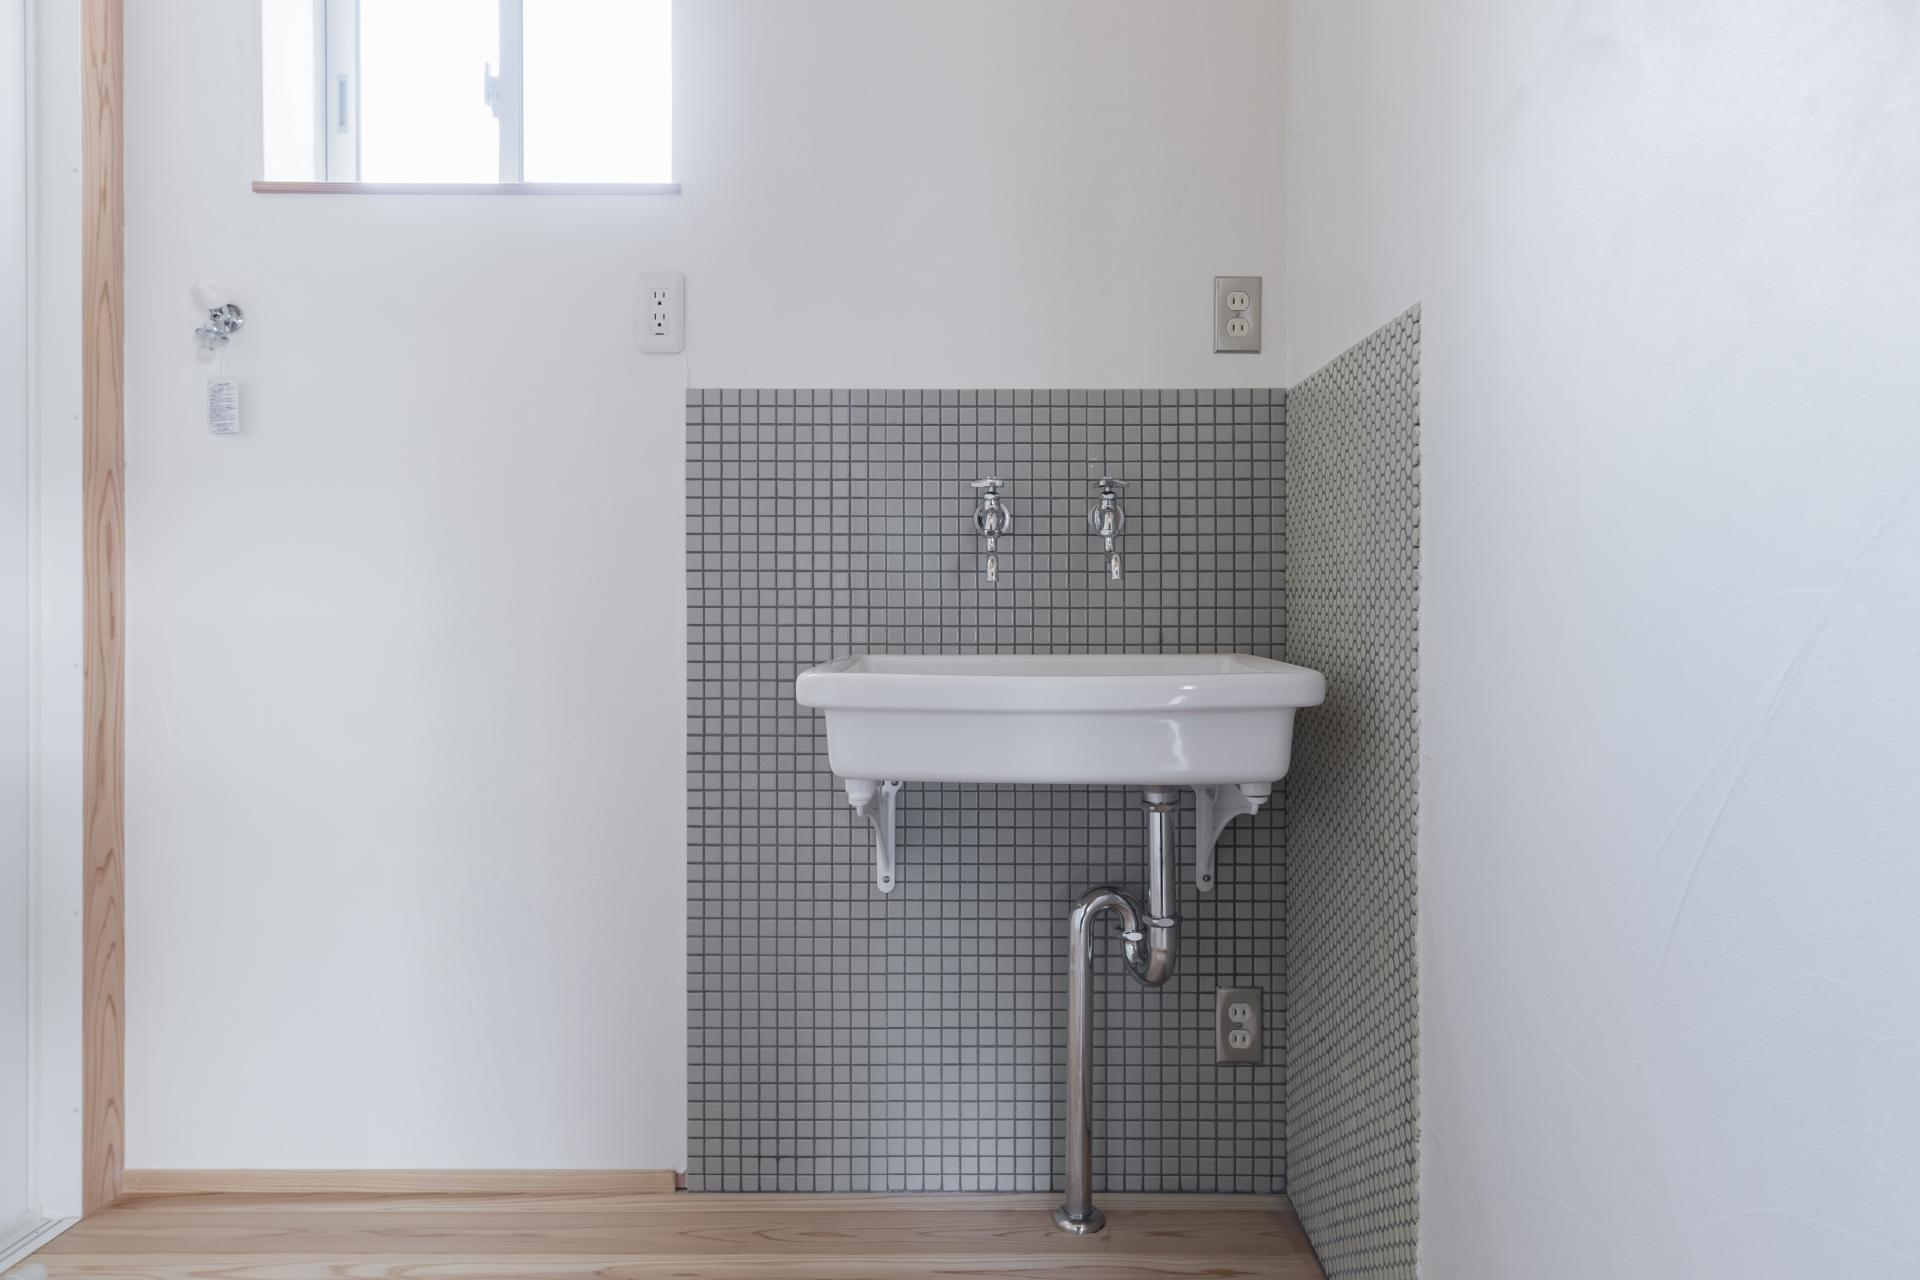 WOODLIFE style 丸守木材【子育て、自然素材、平屋】懐かしさを感じる洗面所。横に洗濯機を置き、レトロな鏡を付ける。蛇口は温水、冷水の2つに分けるこだわり